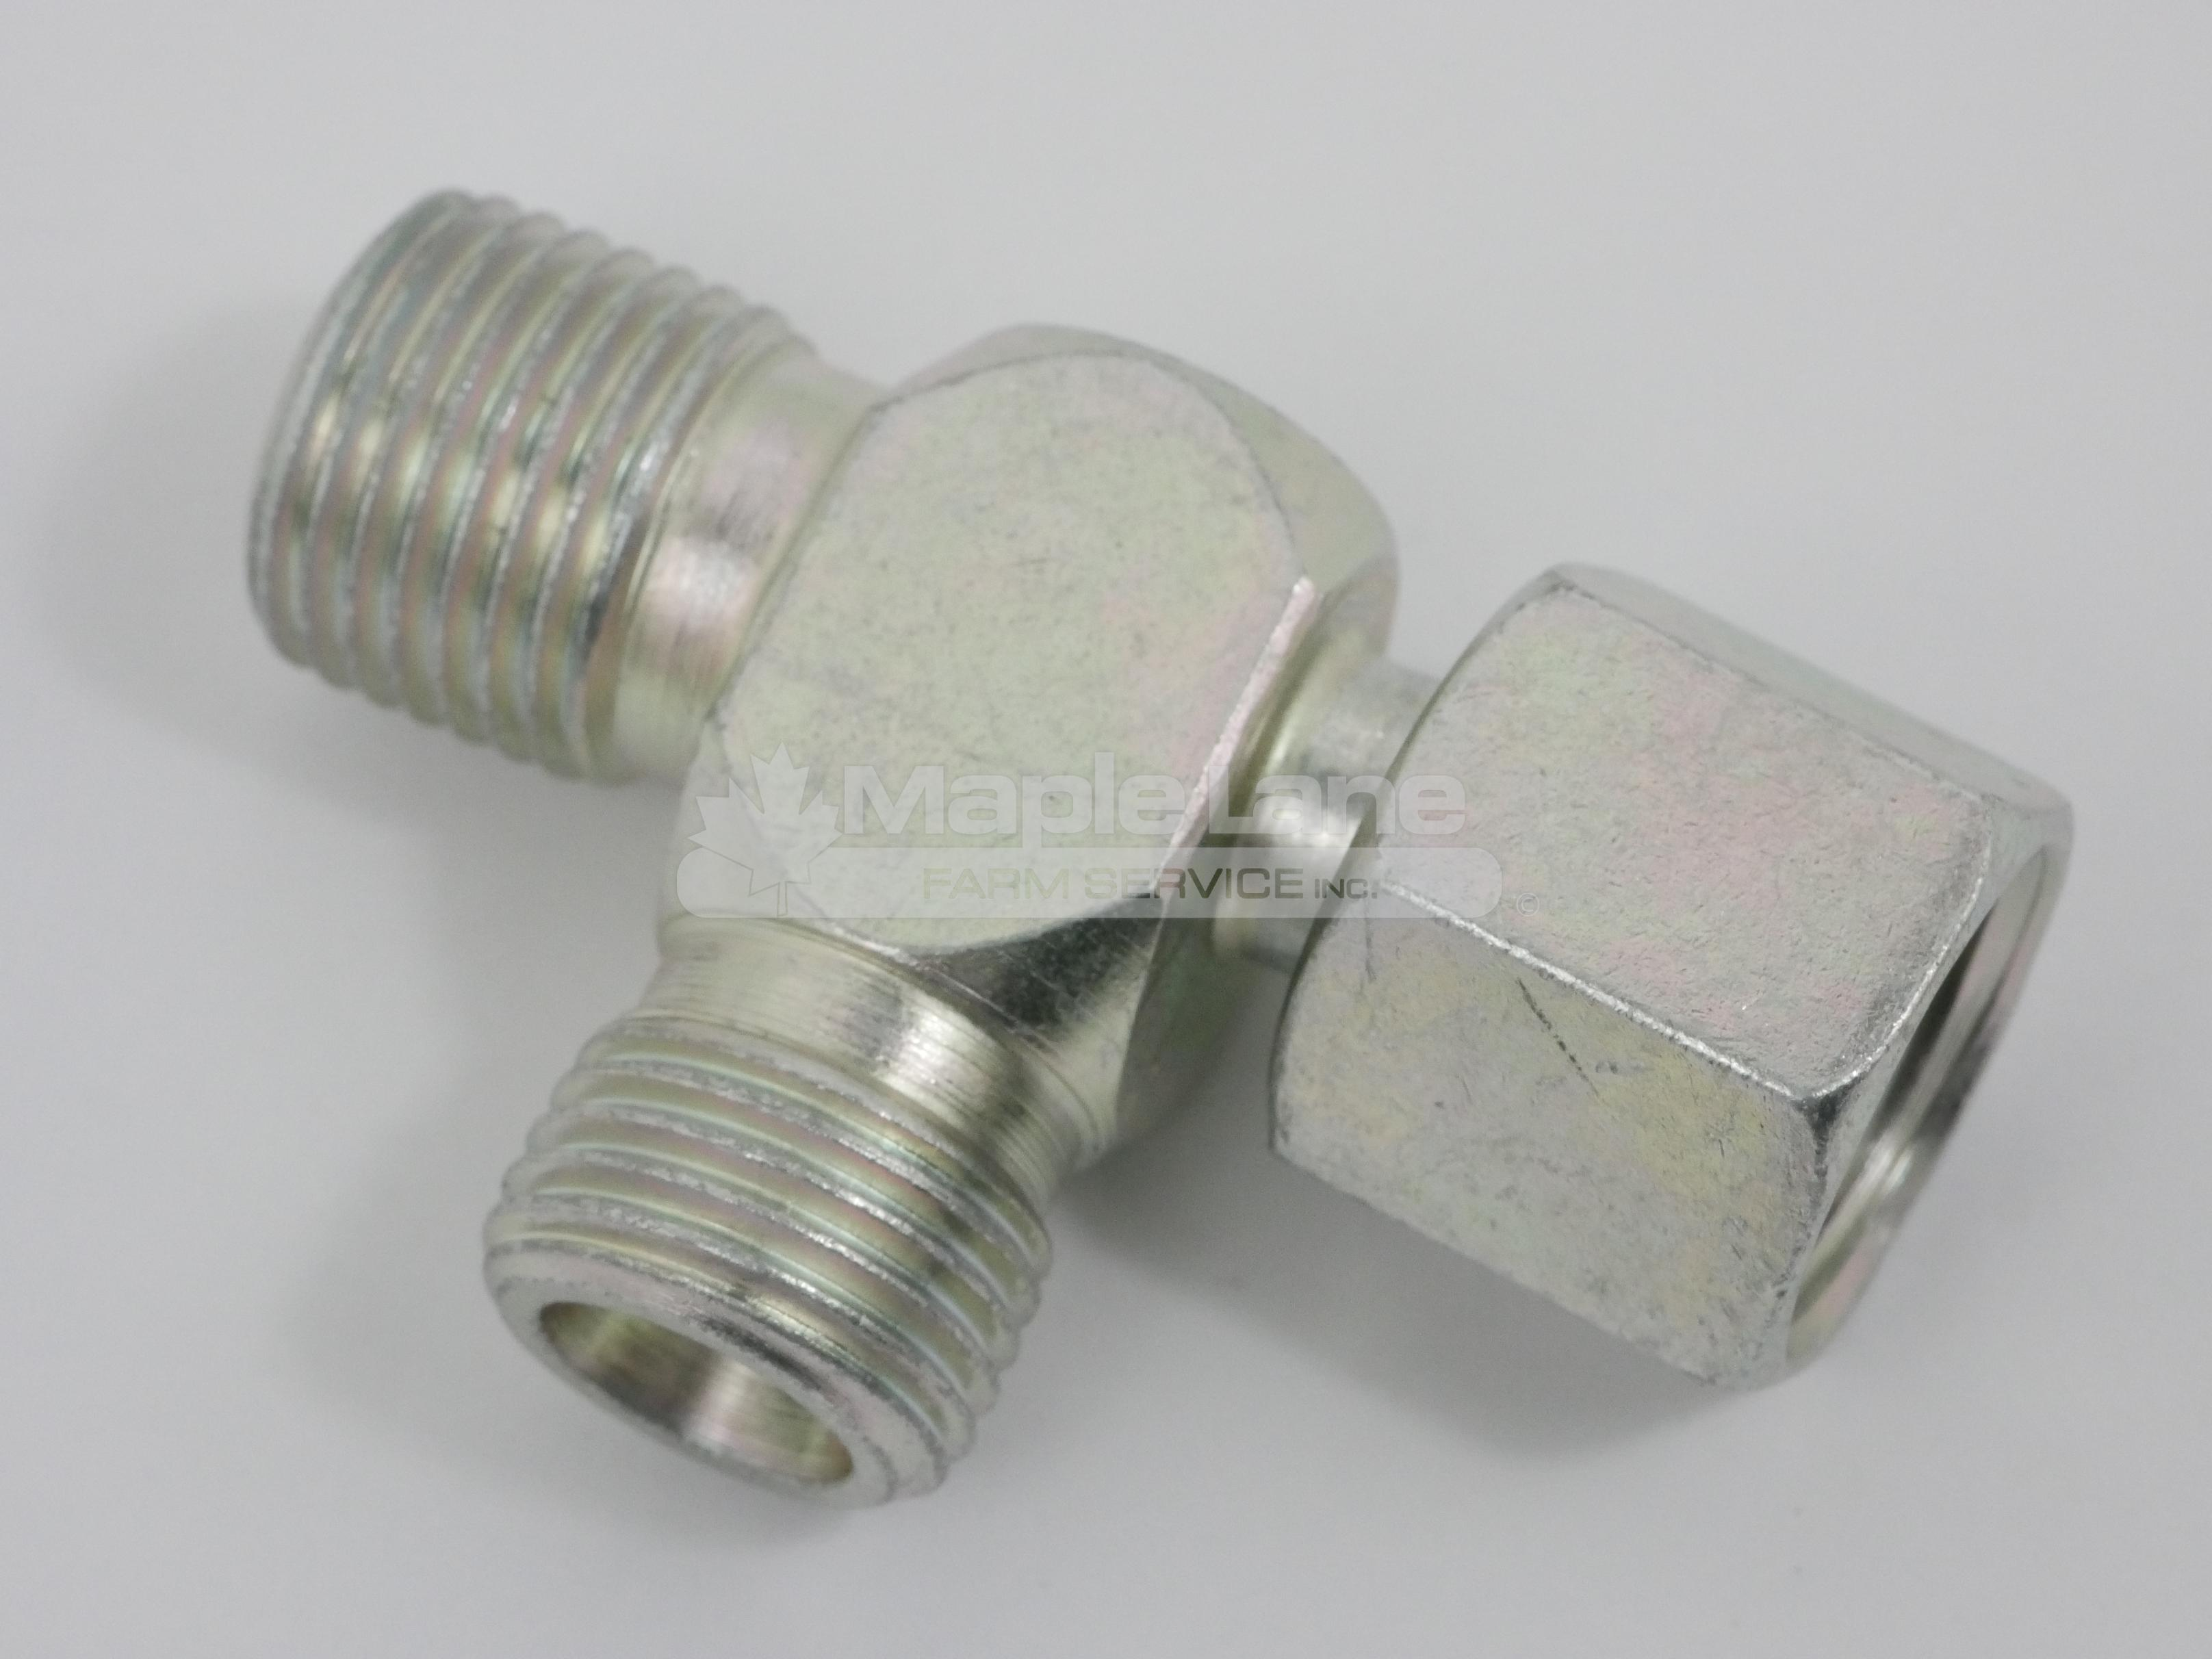 J190442 Tee Fitting